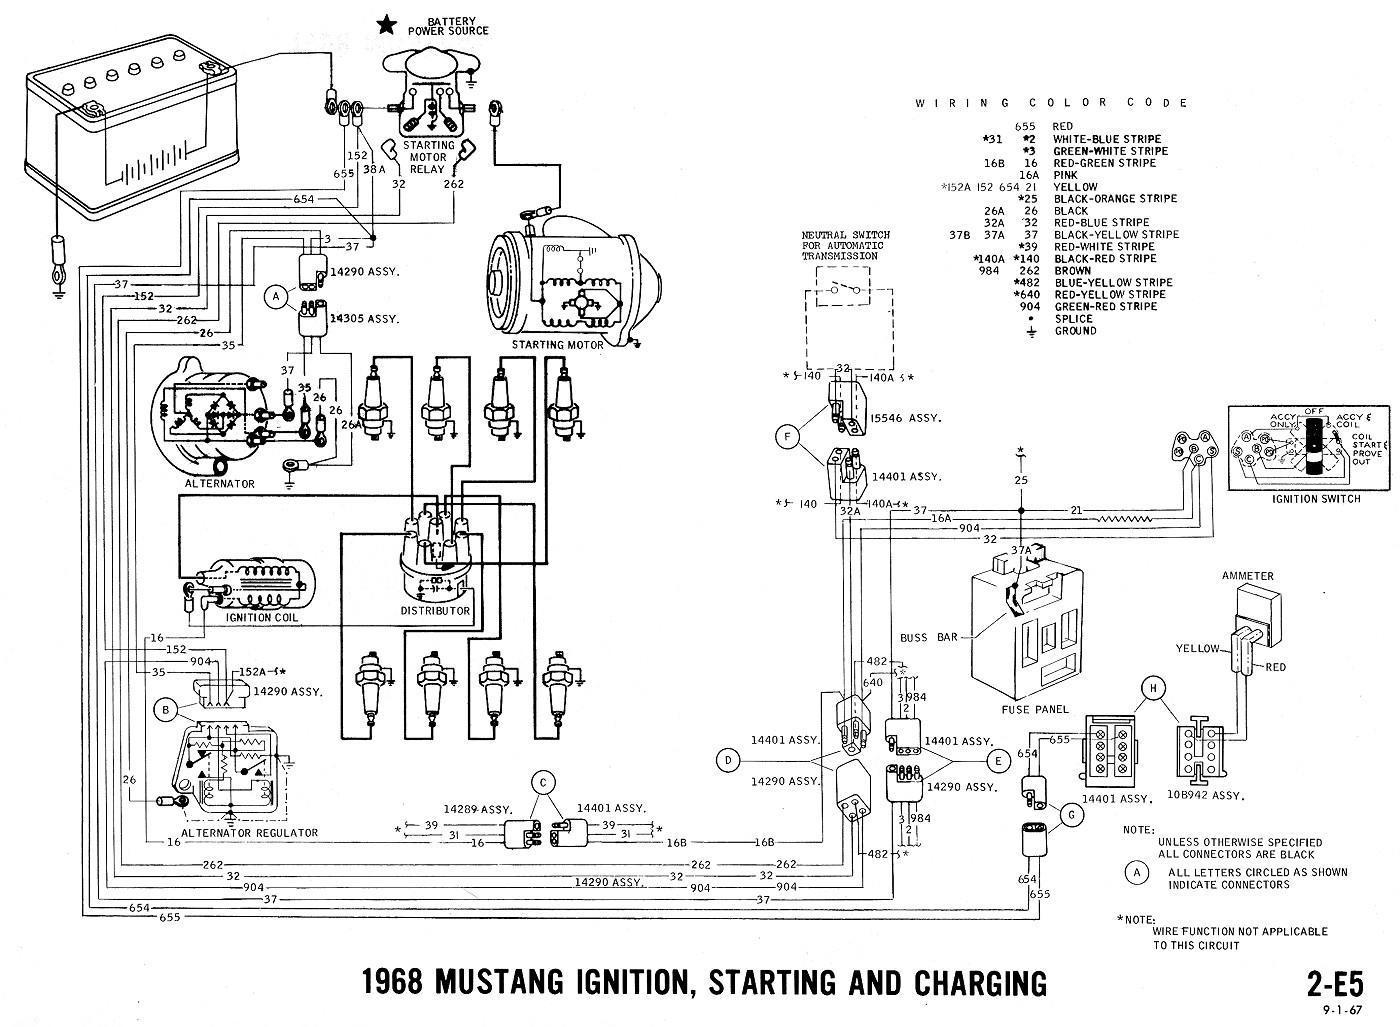 1967 mustang alternator wiring diagram - 1967 mustang alternator wiring  diagram beautiful wiring 1967 ford mustang